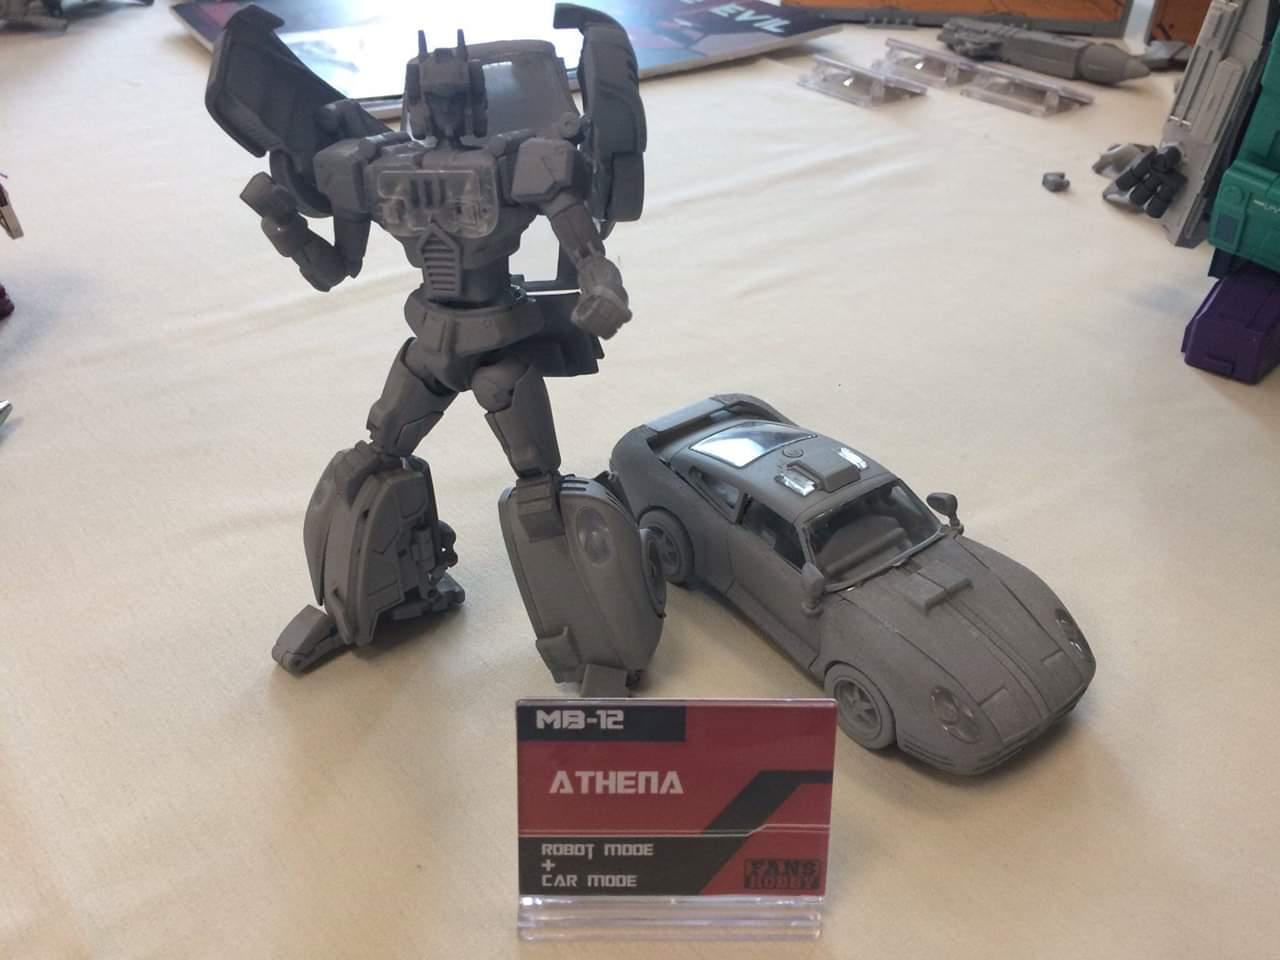 [FansHobby] Produit Tiers - MB-12 Athena (aka Minerva|Nightbeat/Veilleur) et MB-13 (aka Goshooter|Siren/Sirène) [TF Masterforce] MFuWJ8UN_o